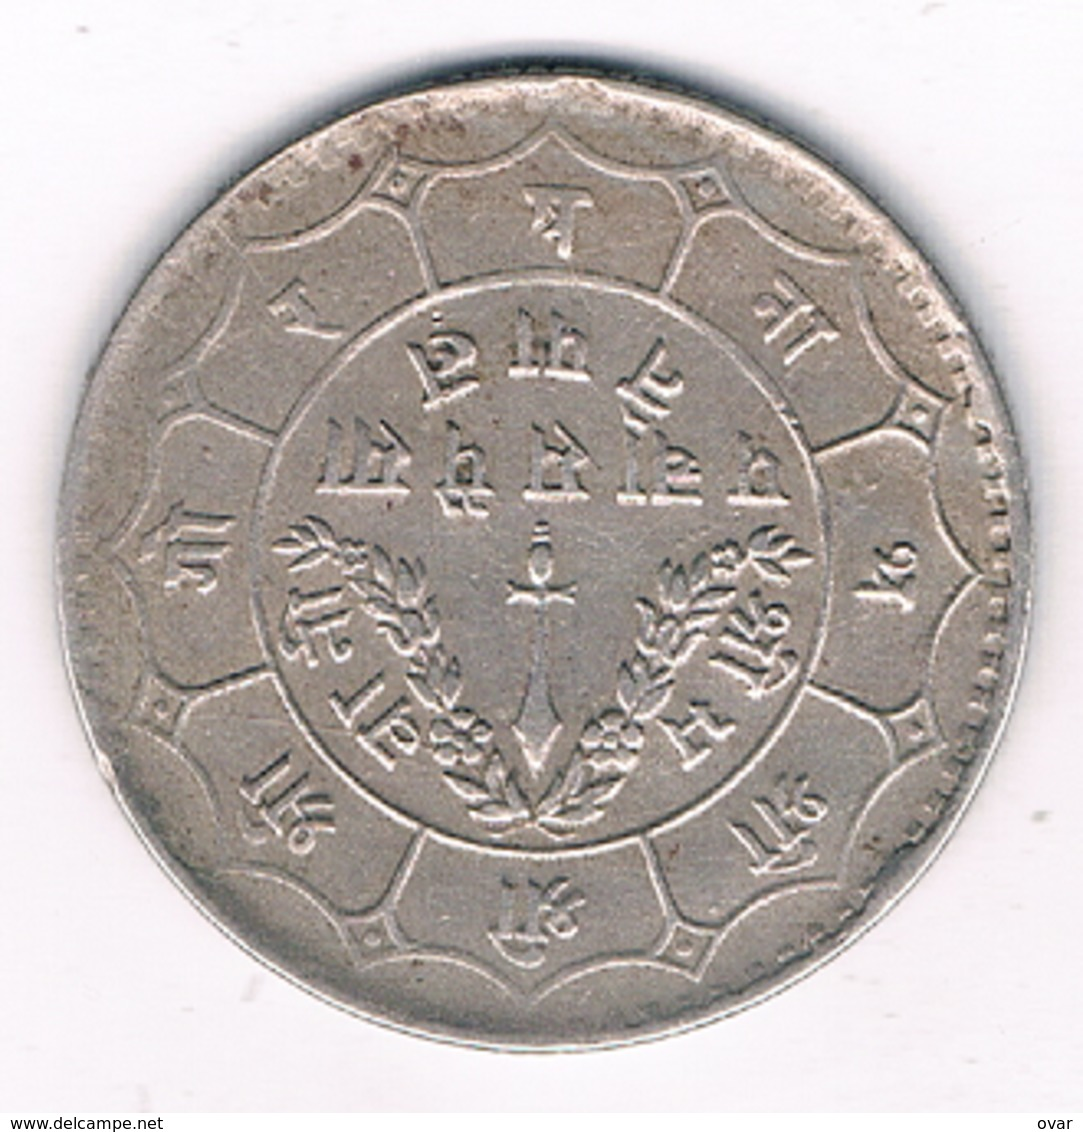 1 RUPEE 1955 NEPAL /1584G/ - Népal